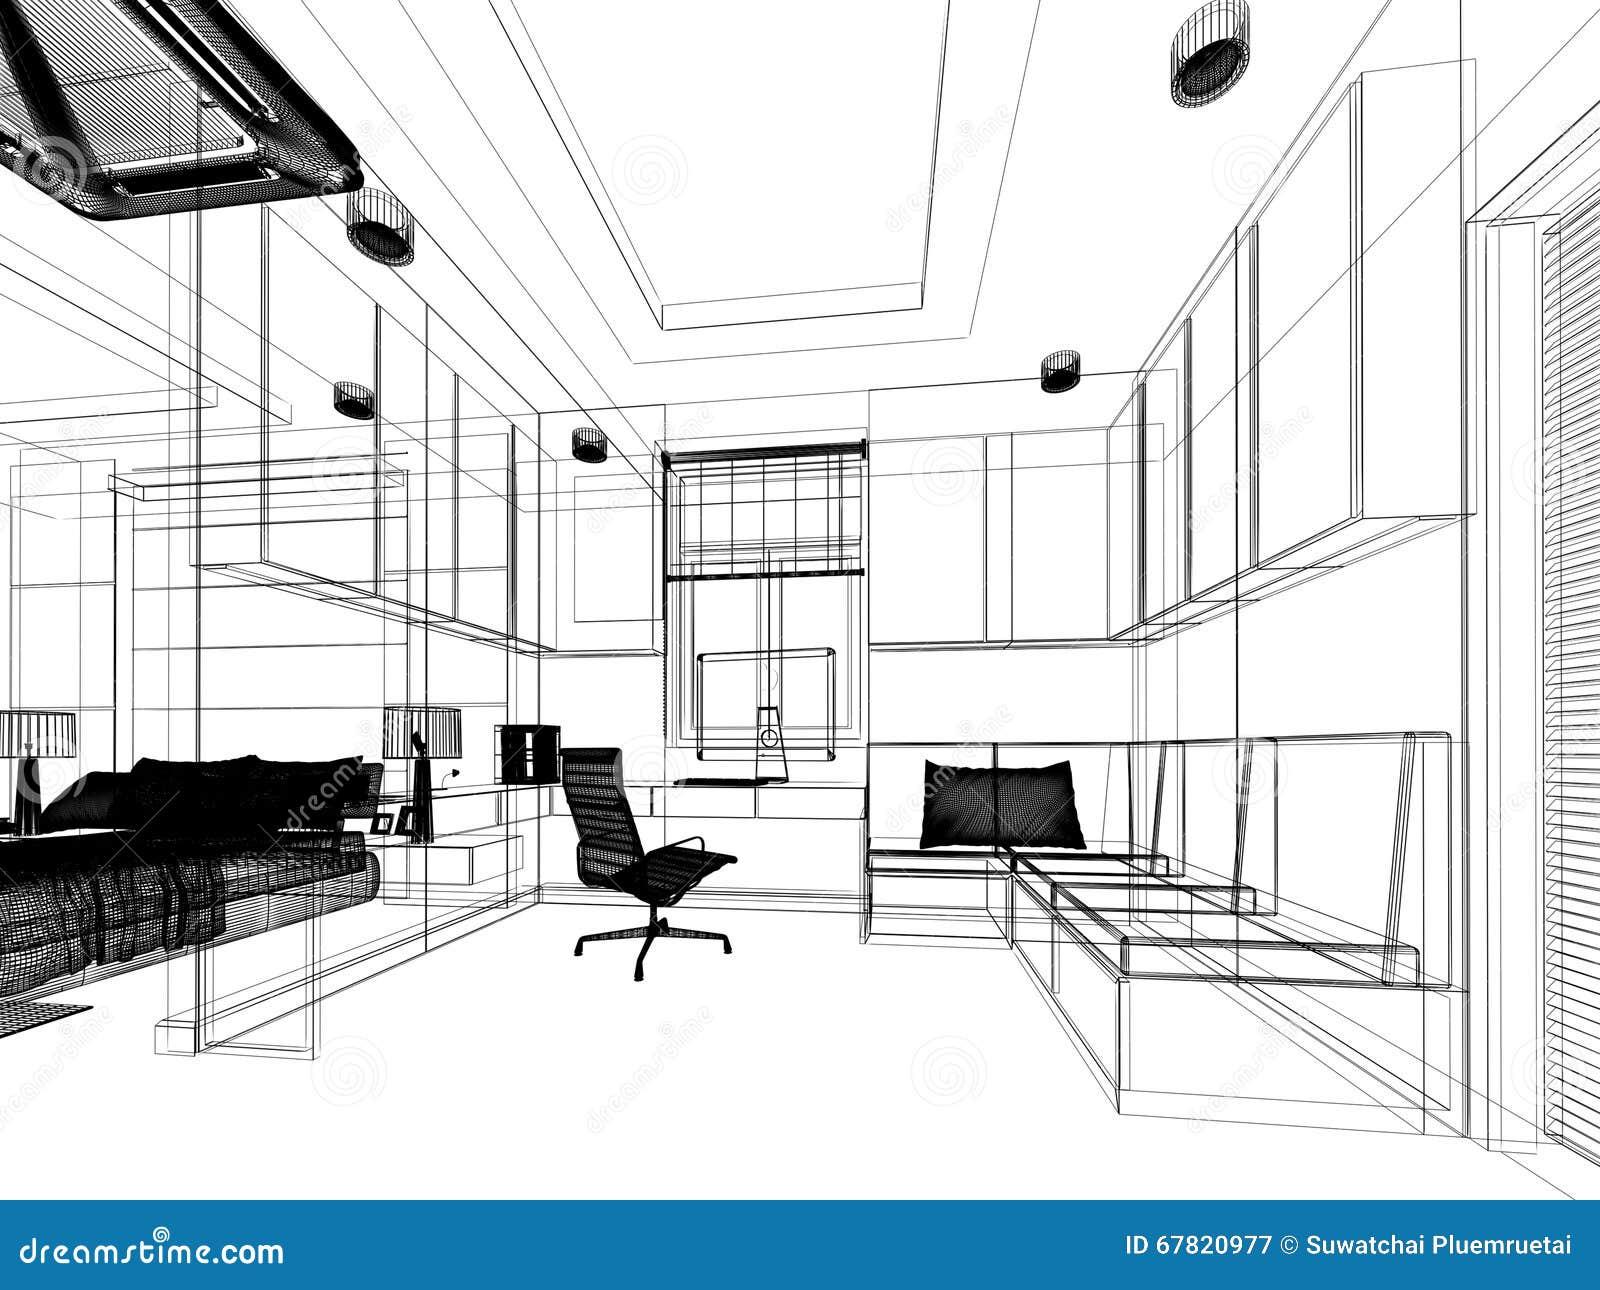 Sketch Design Of Study Room